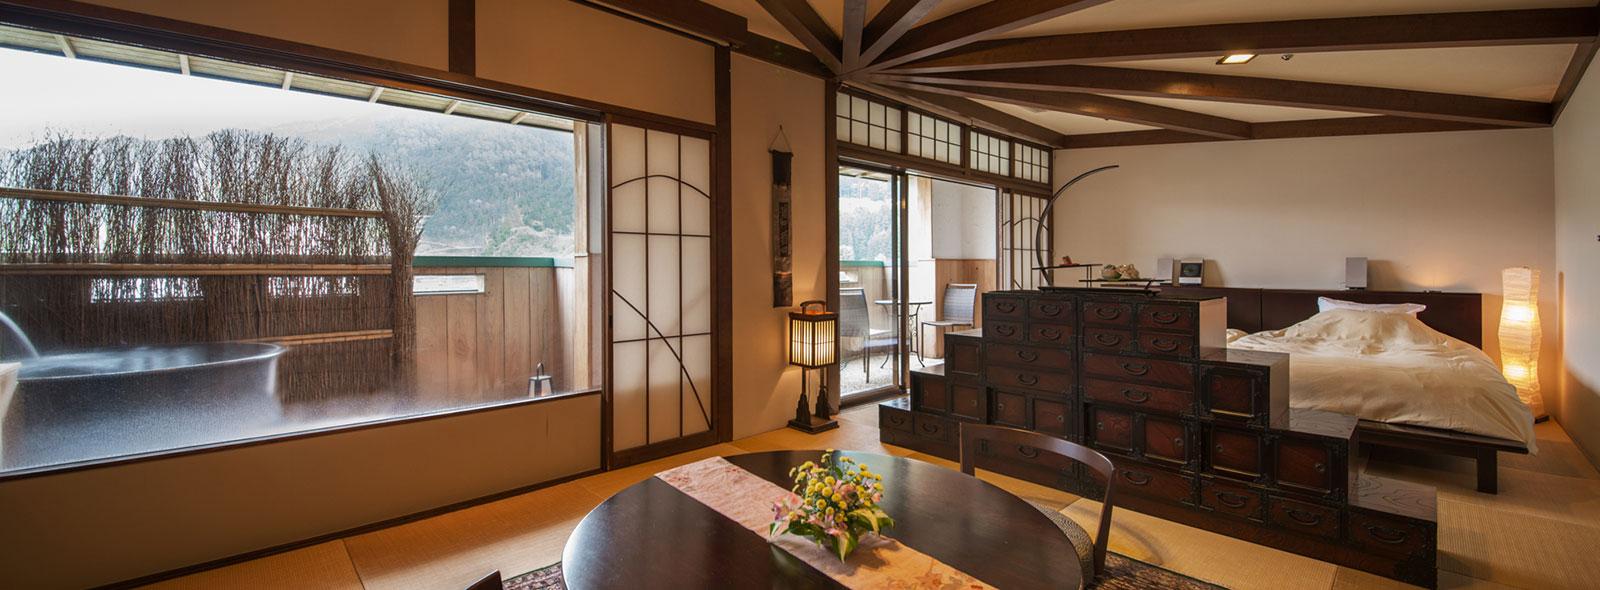 Japan Ryokan And Hotel Association